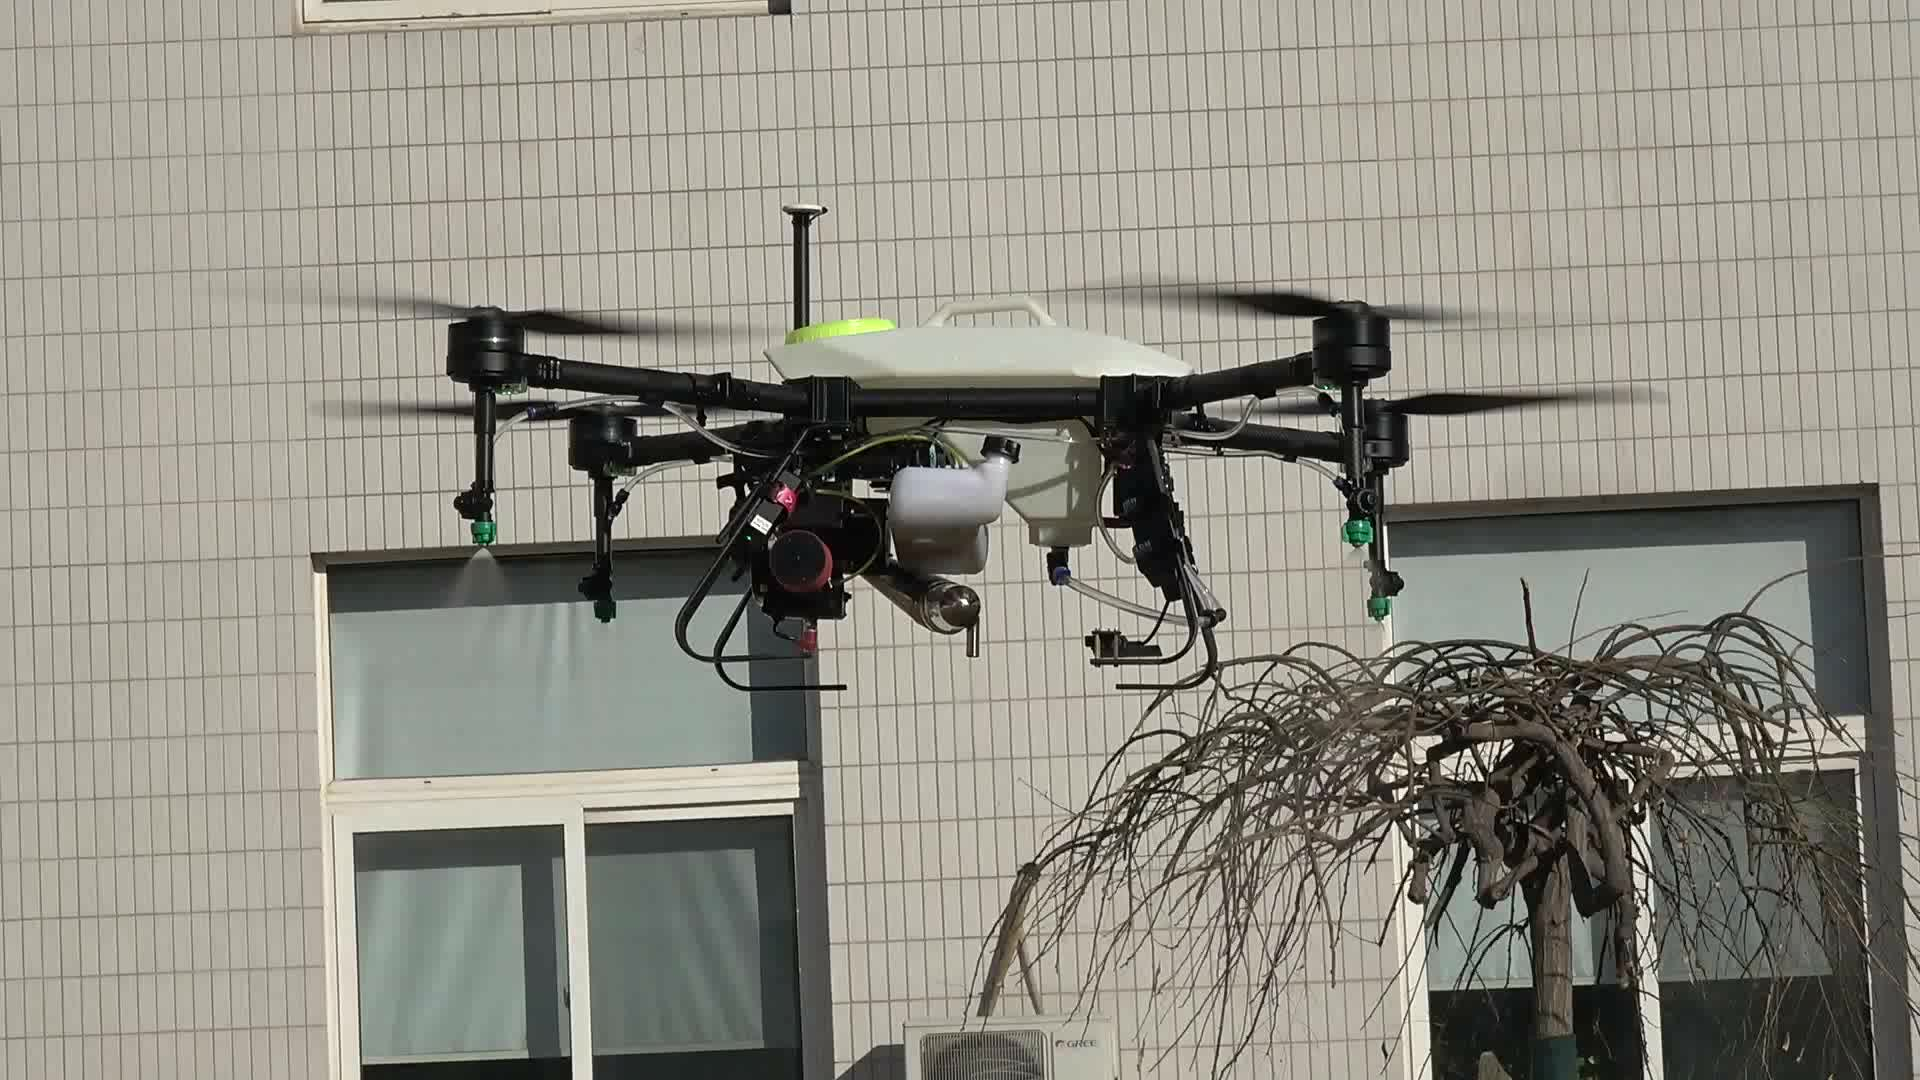 NEW professional agriculture drone pesticide spray 10L hybrid uav sprayer with Radar Terrain Following System